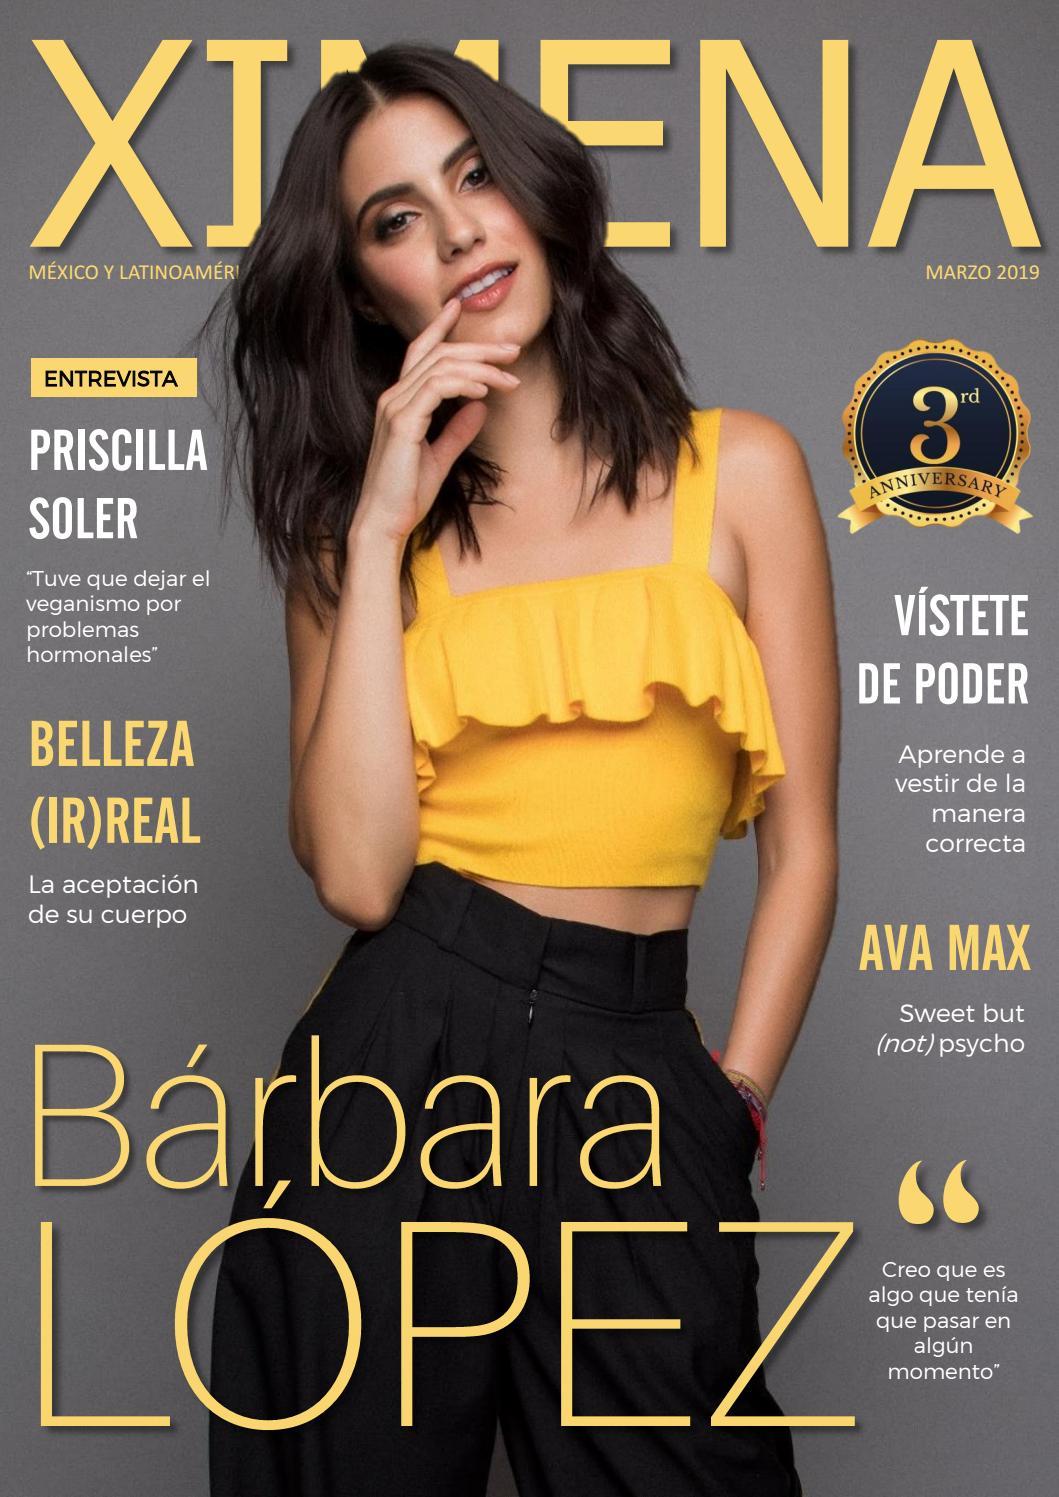 3cb486a93 Revista Ximena - Marzo 2019 | Bárbara López by Revista Ximena - issuu